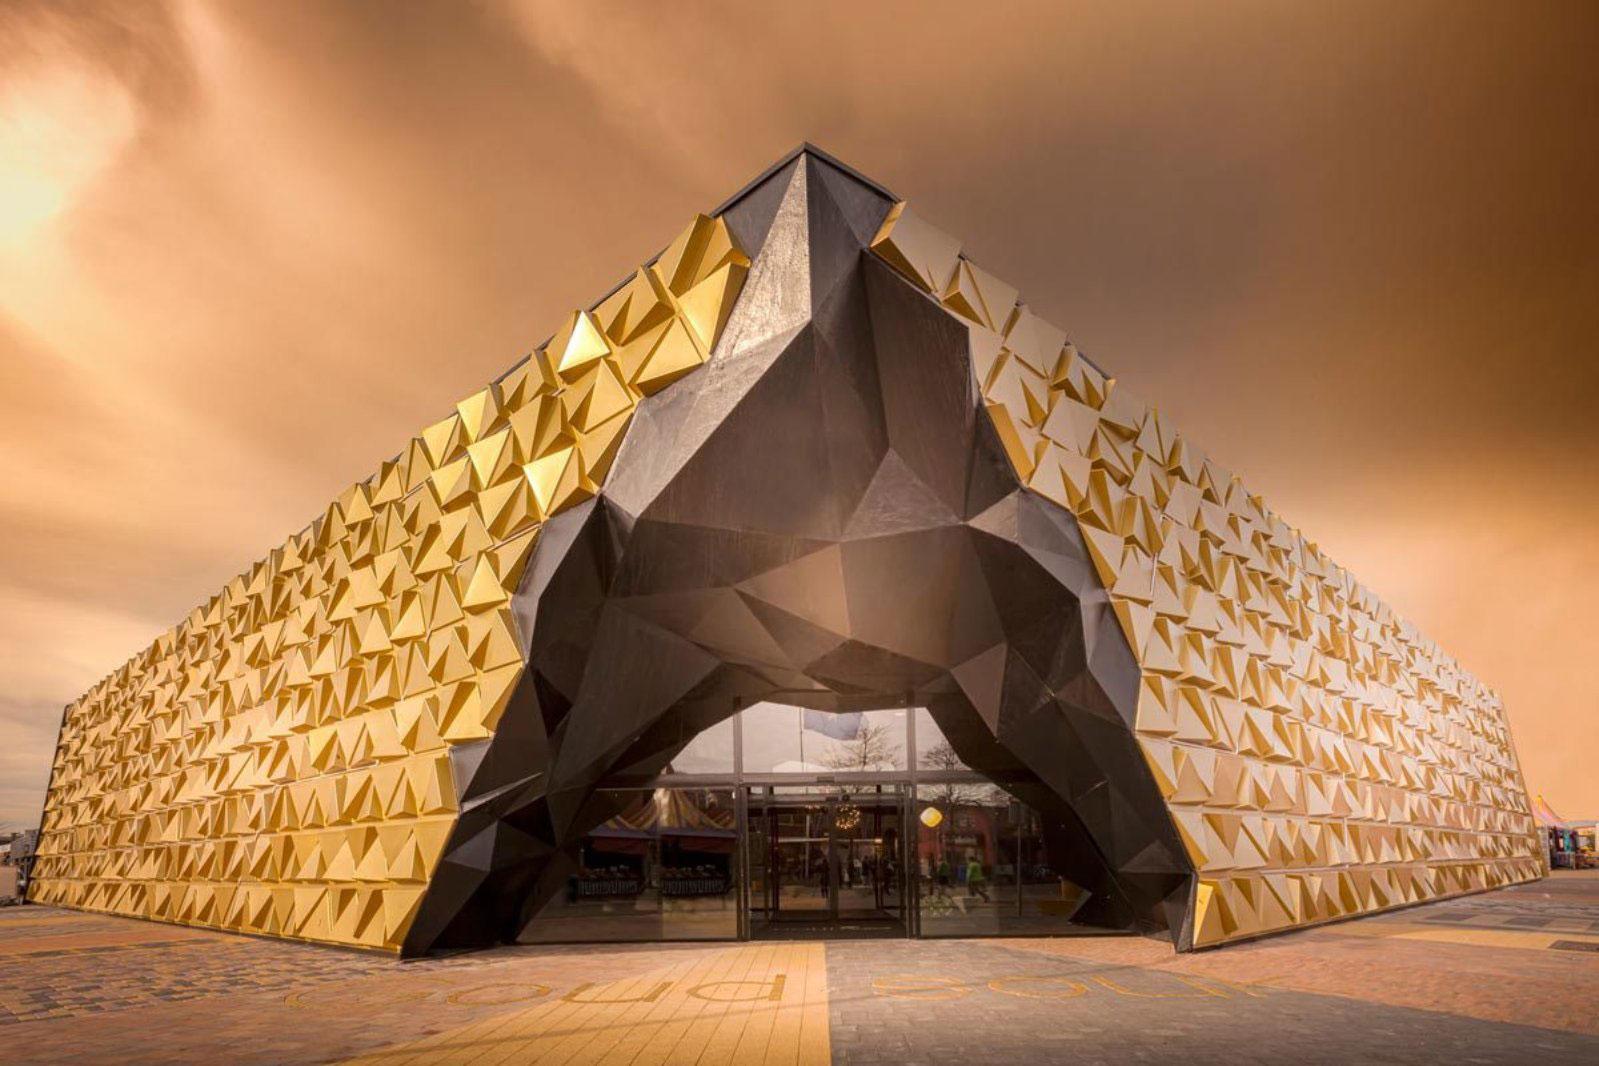 Goud Souk, Gold, Beverwijk, Netherlands, Liong Lie Architects, Leaders Against Routine, Hannah Anthonysz